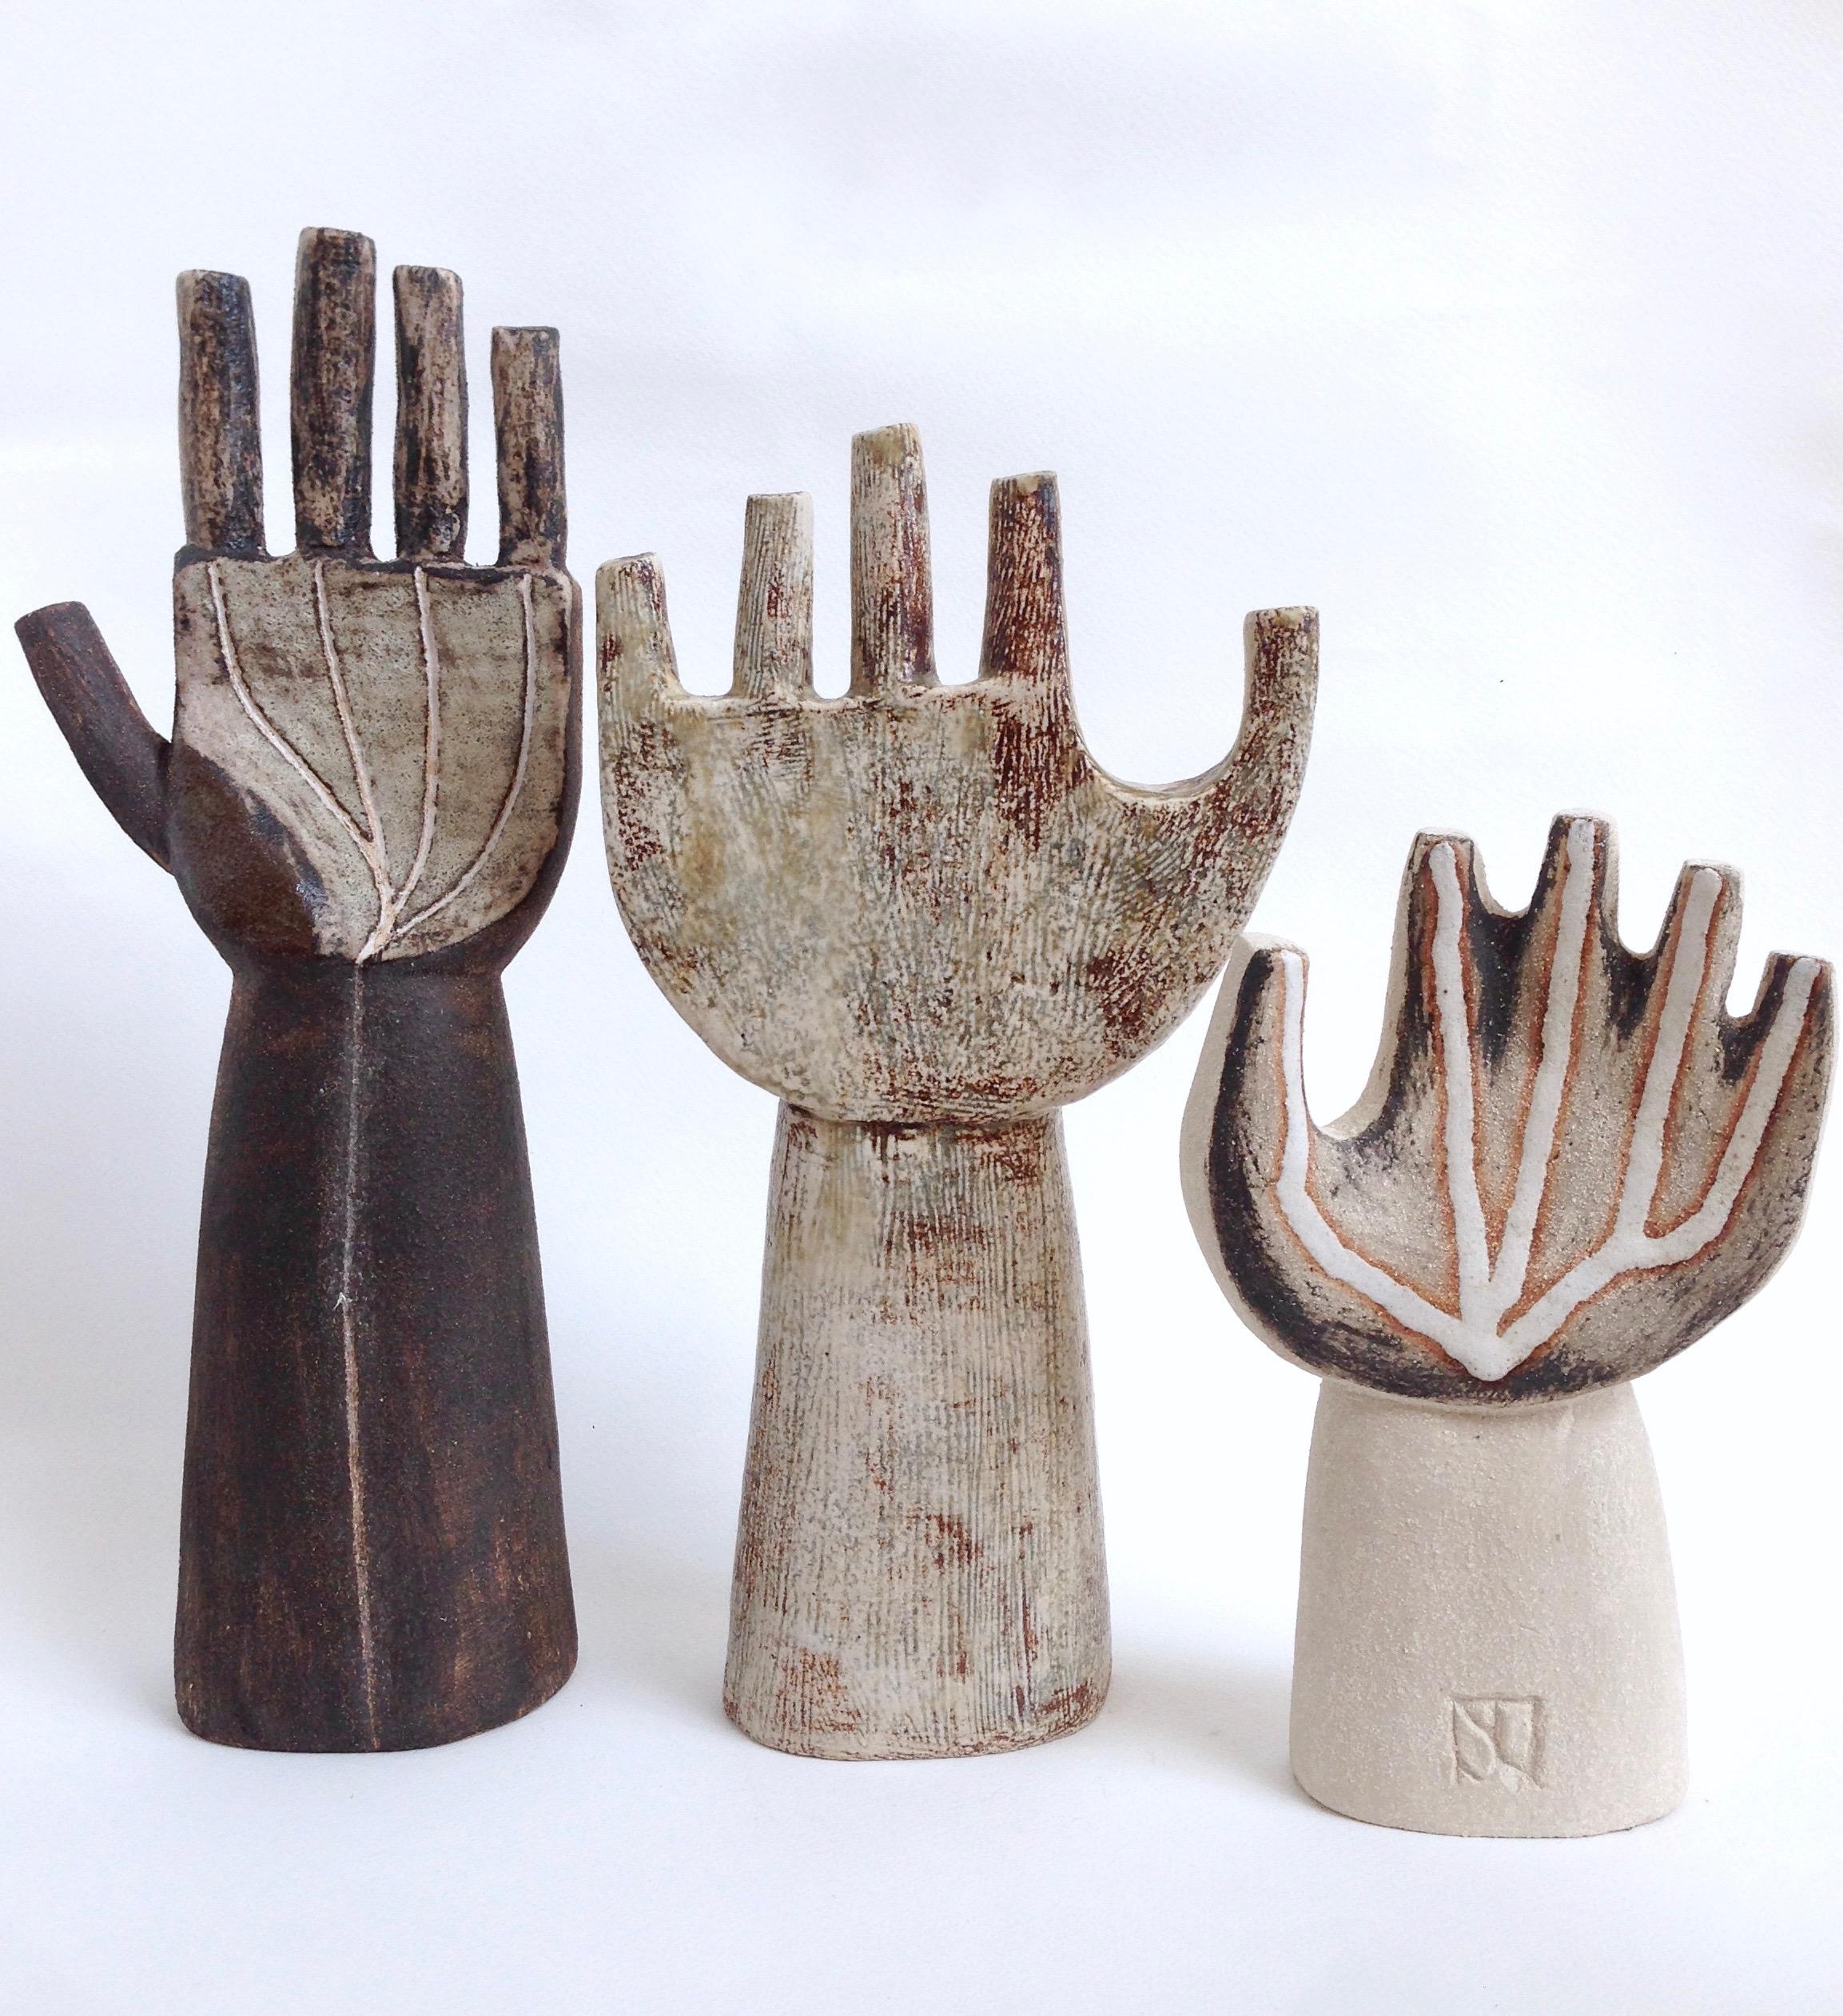 Ceramic hands: Delta, Curve and venule